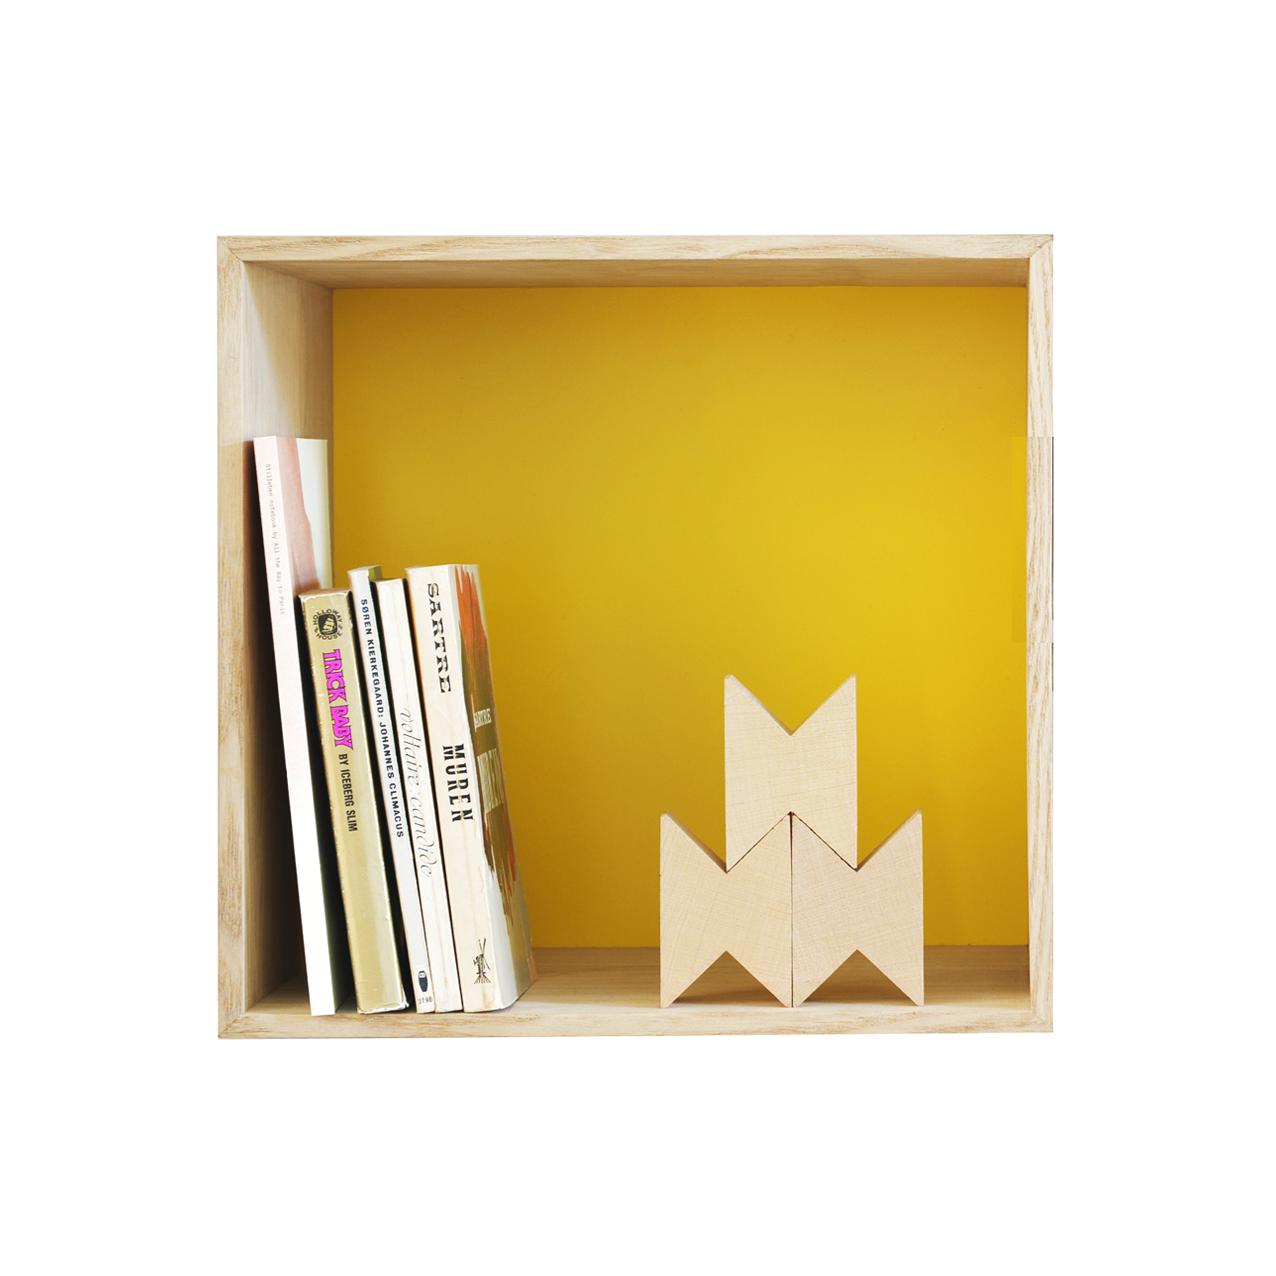 Etagère mini stacked m   frêne/jaune muuto pour chambre enfant ...